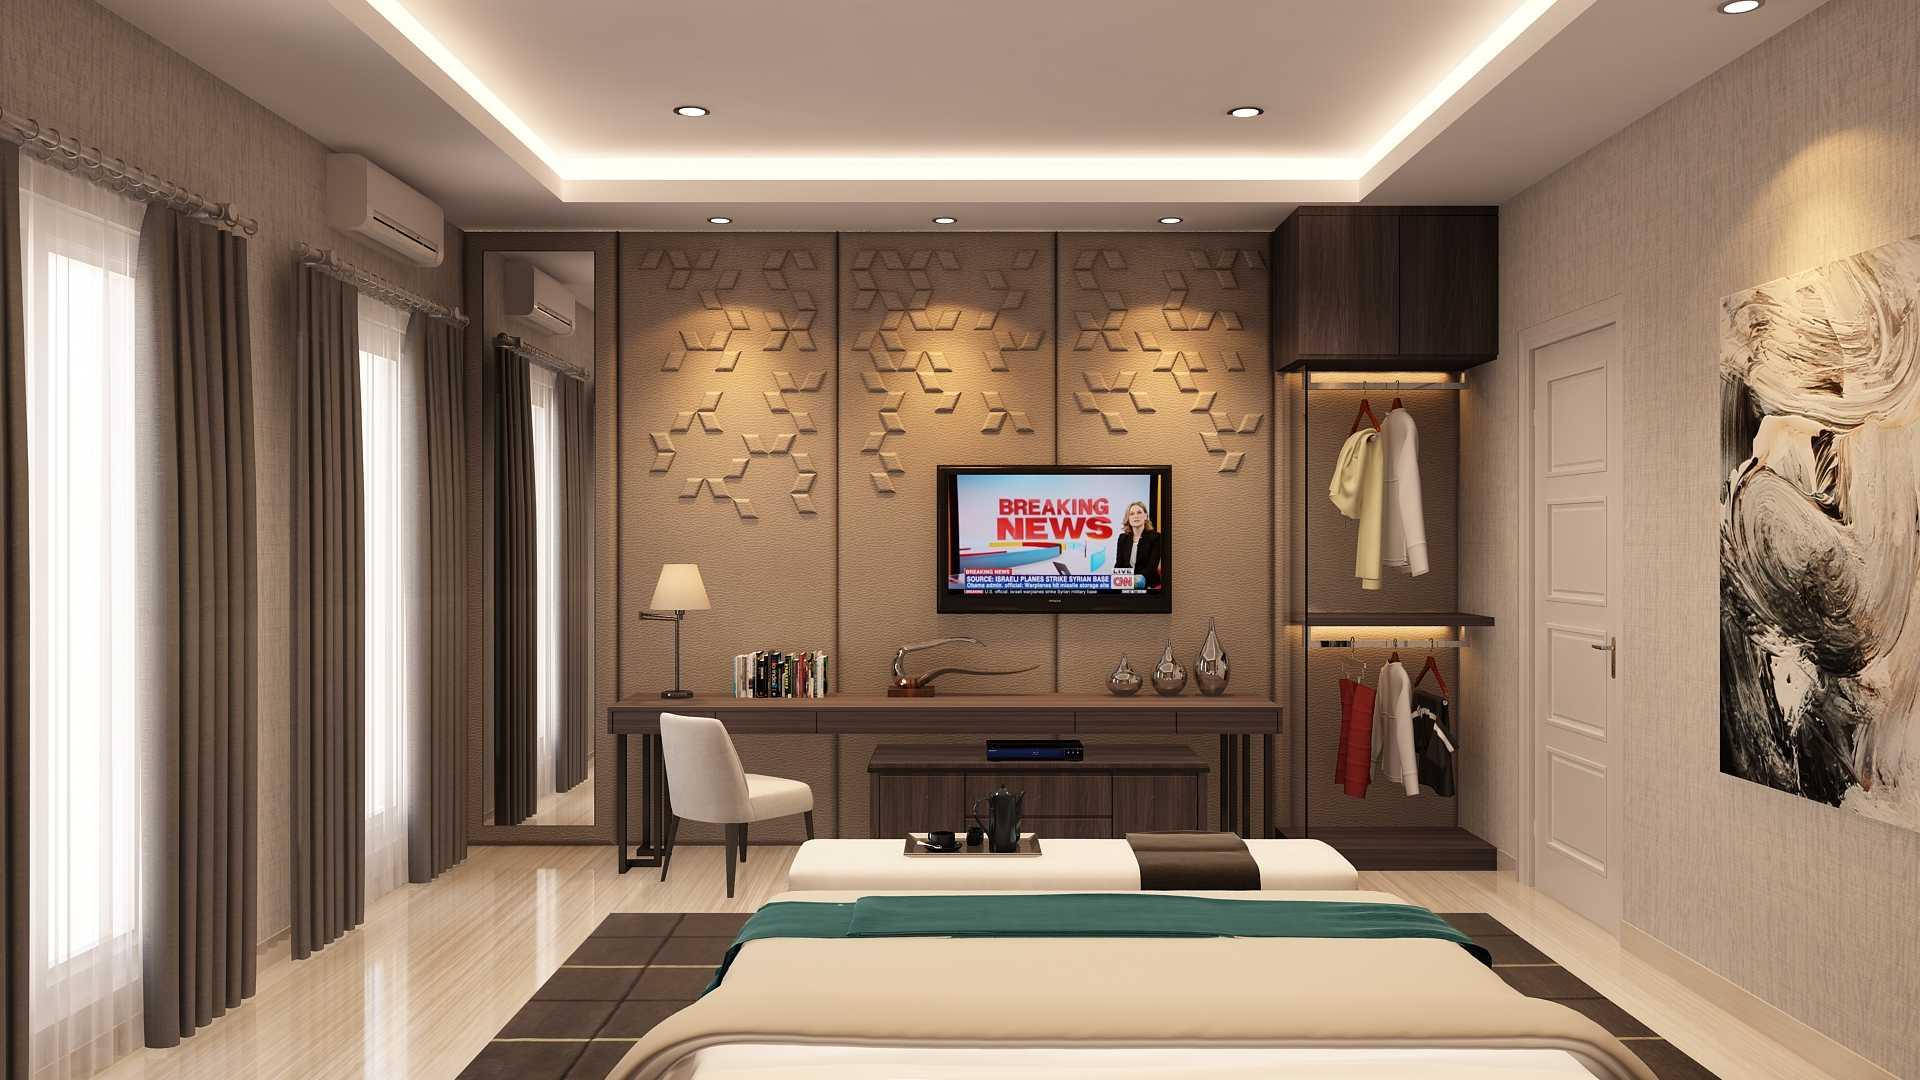 Simplifica Interior Contemporary House Surabaya, Kota Sby, Jawa Timur, Indonesia Surabaya, Kota Sby, Jawa Timur, Indonesia Simplifica-Interior-Contemporary-House  62970